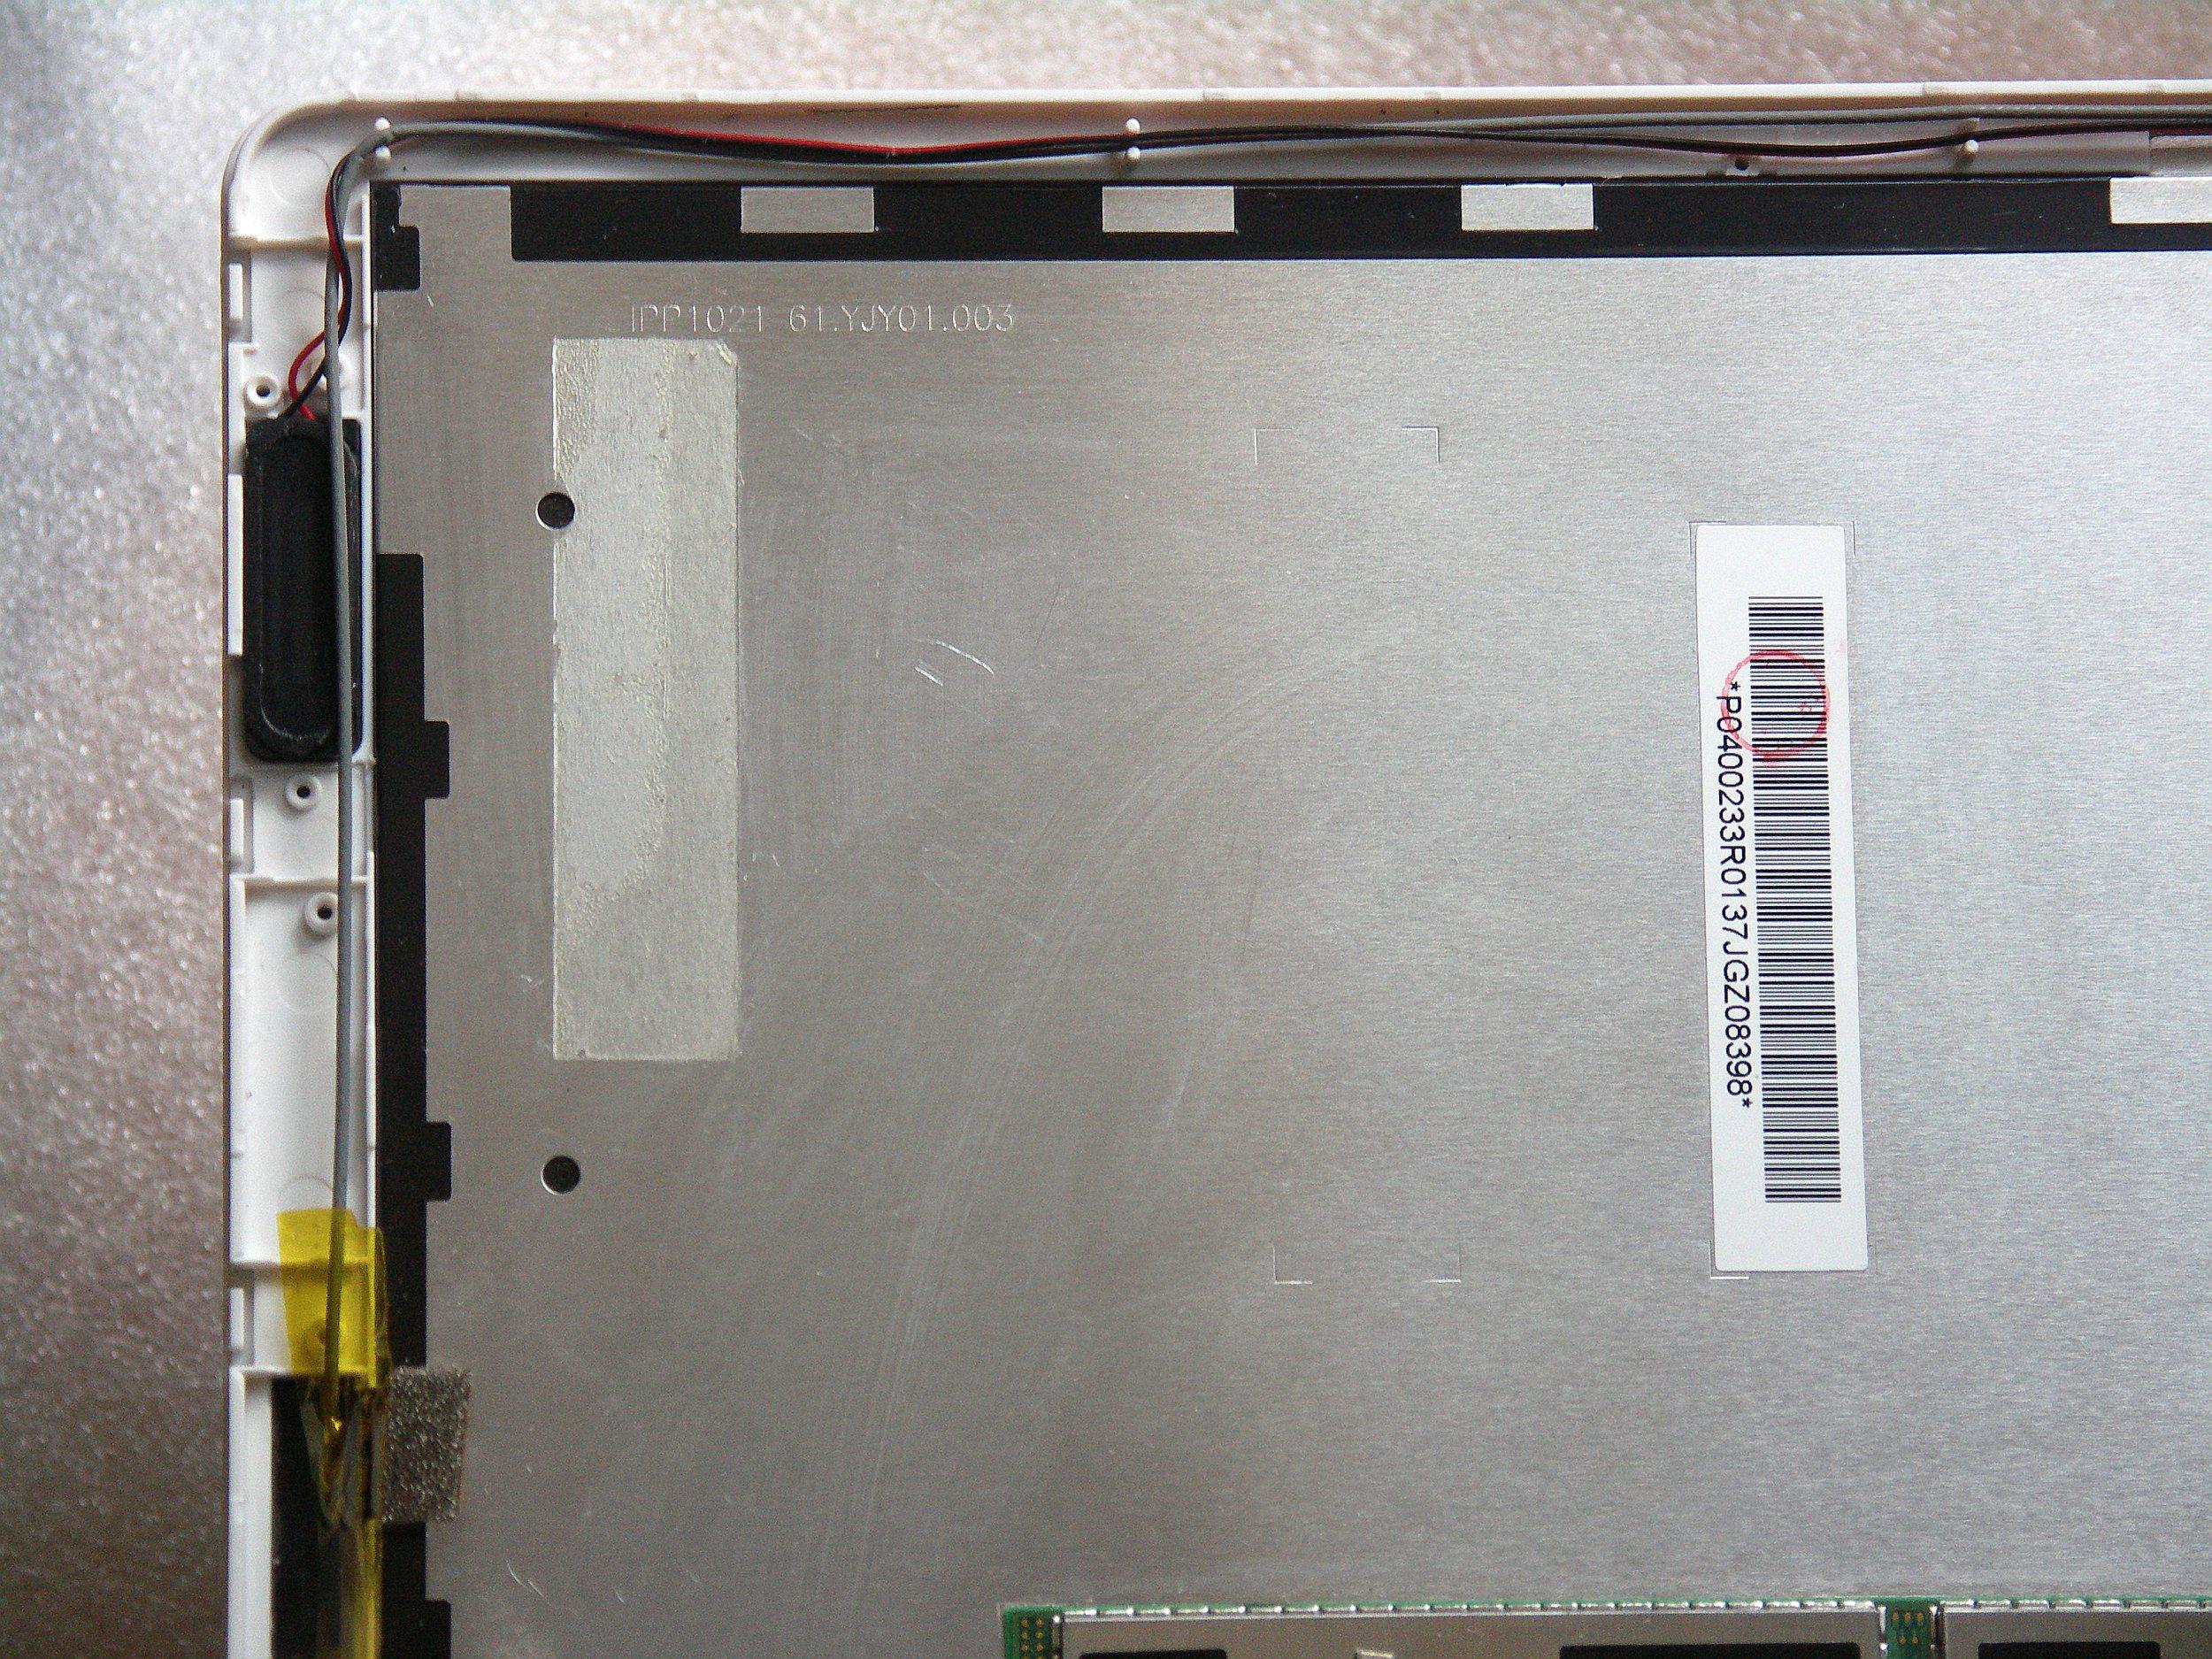 Arctablet cube u30gt2 firmware